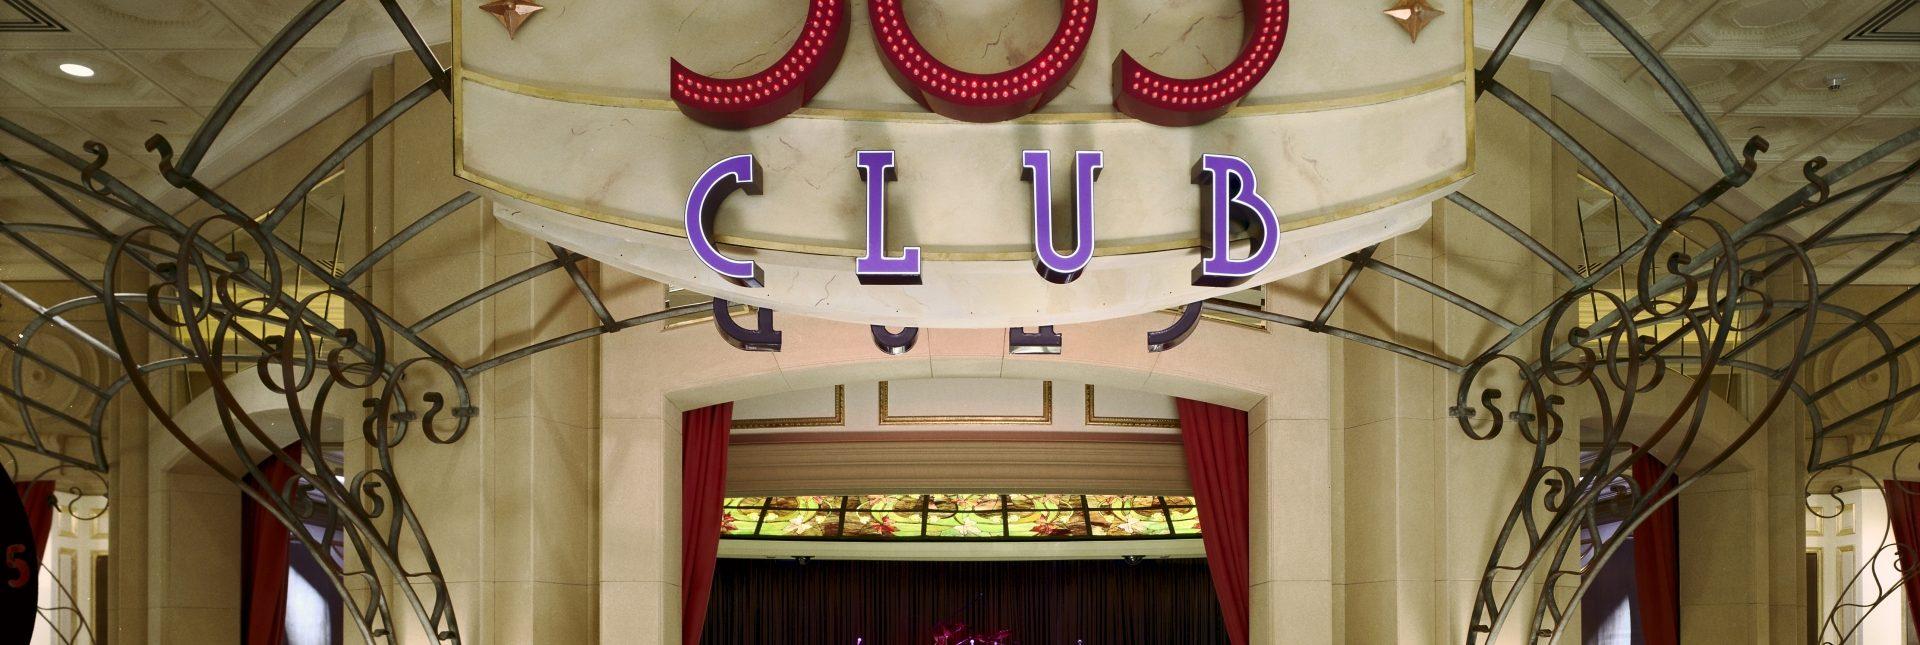 365 club casino